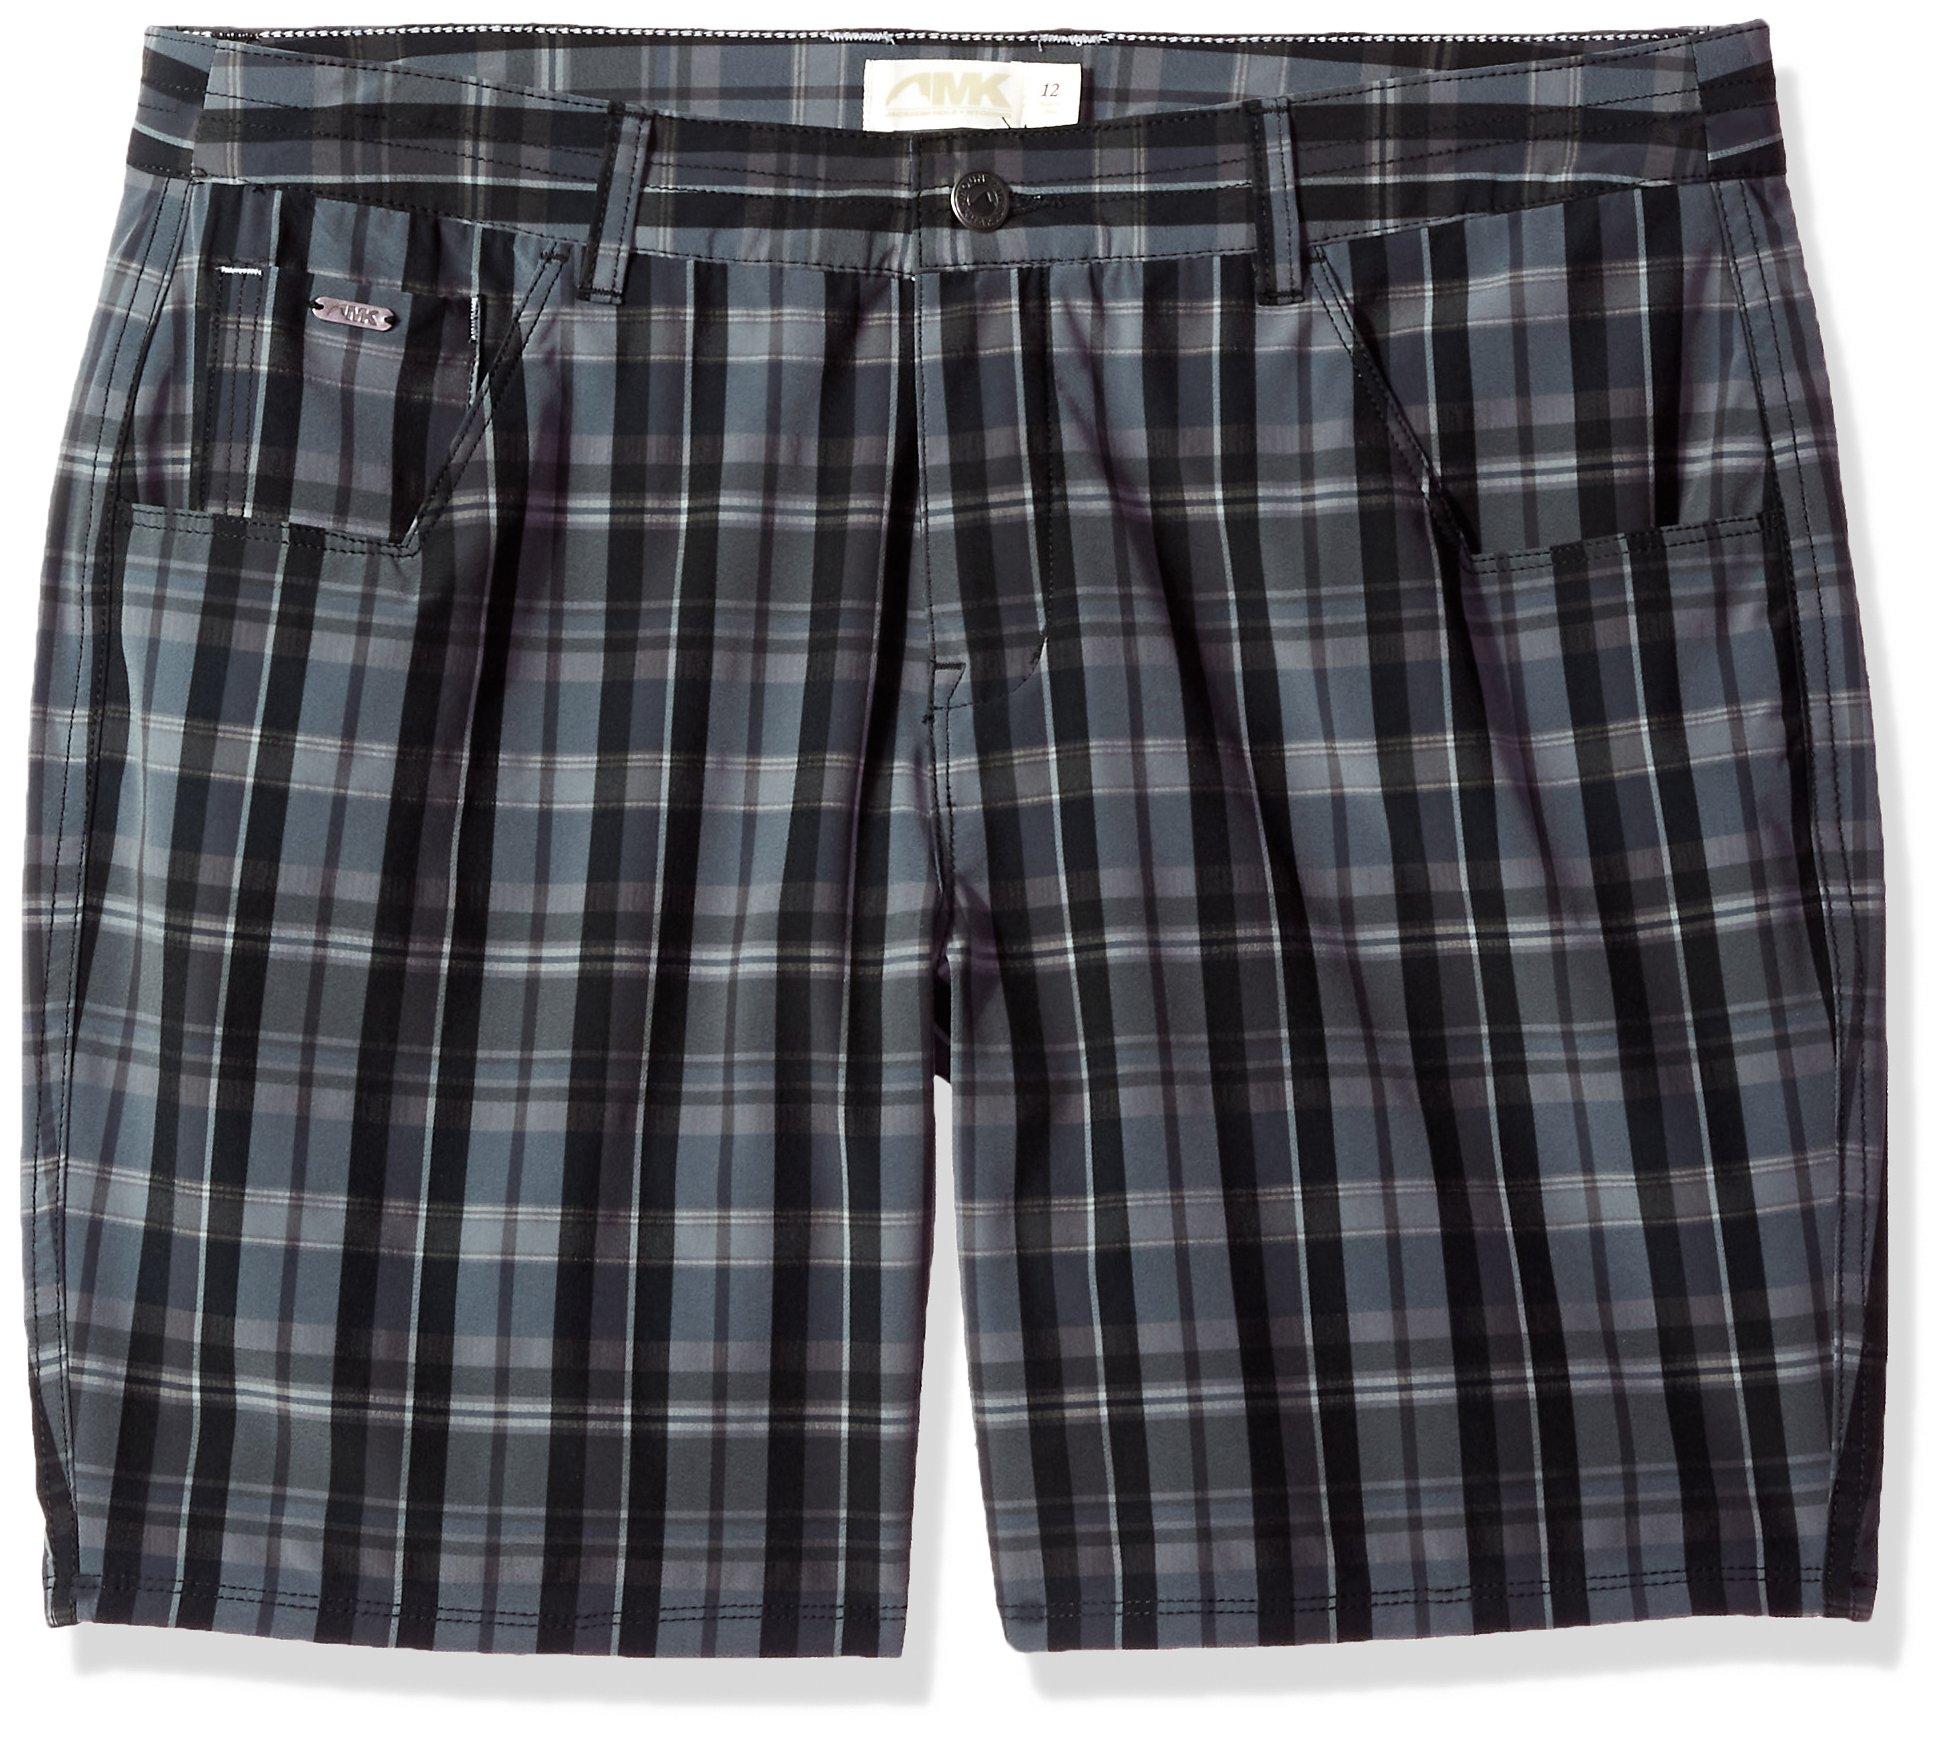 Mountain Khakis Azalea Short Classic fit Shorts, Black Plaid, Size 4/7